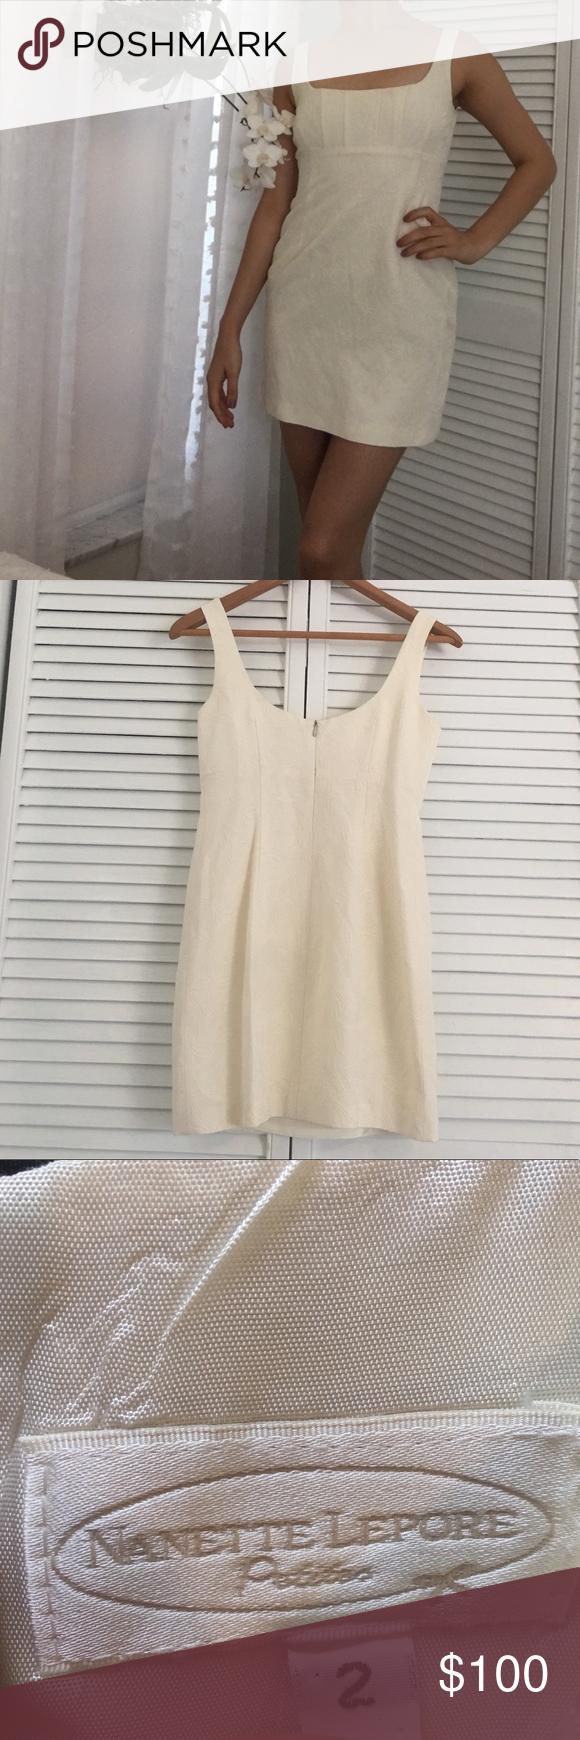 Nanette Lepore Mini Dress Size 2 Beautiful Nanette Lepore Mini Dress Size 2 Open To Offers Nanette Lepore Dresses Mini Clothes Design Fashion Fashion Design